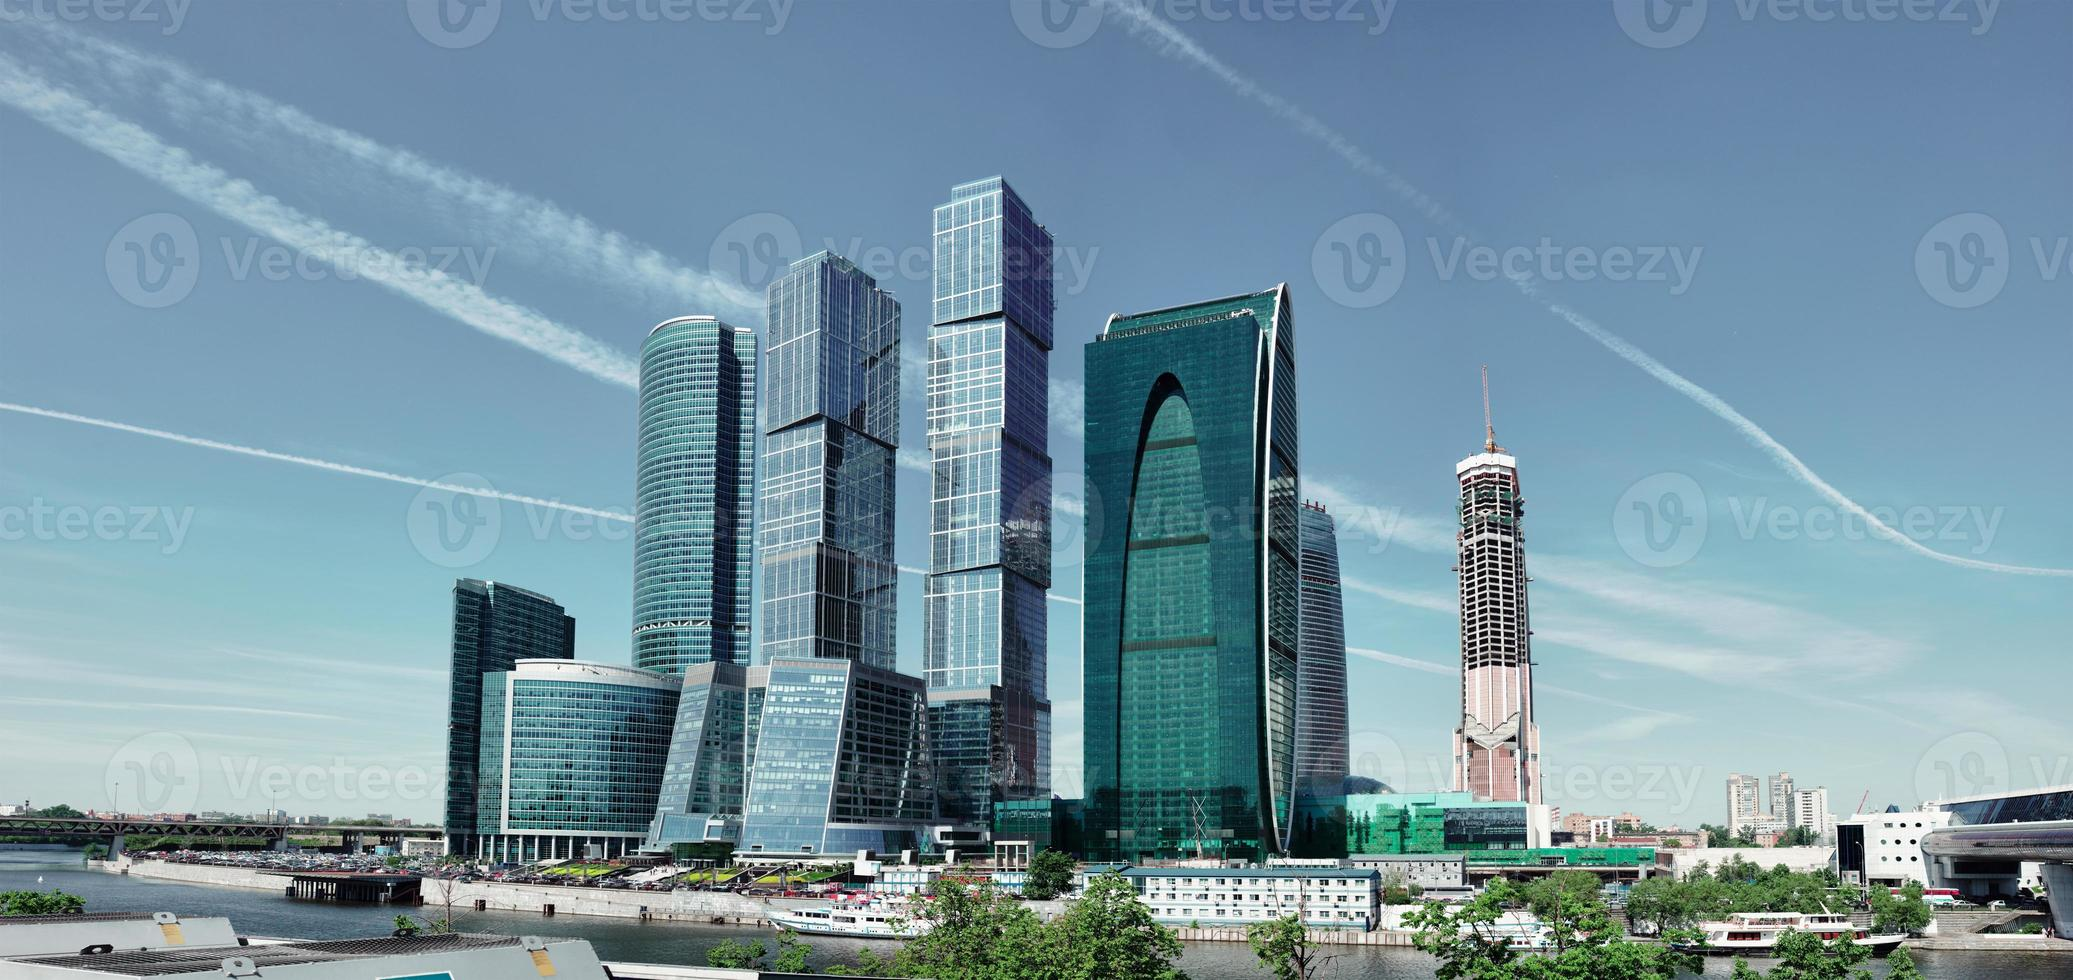 grattacieli moderni a Mosca foto